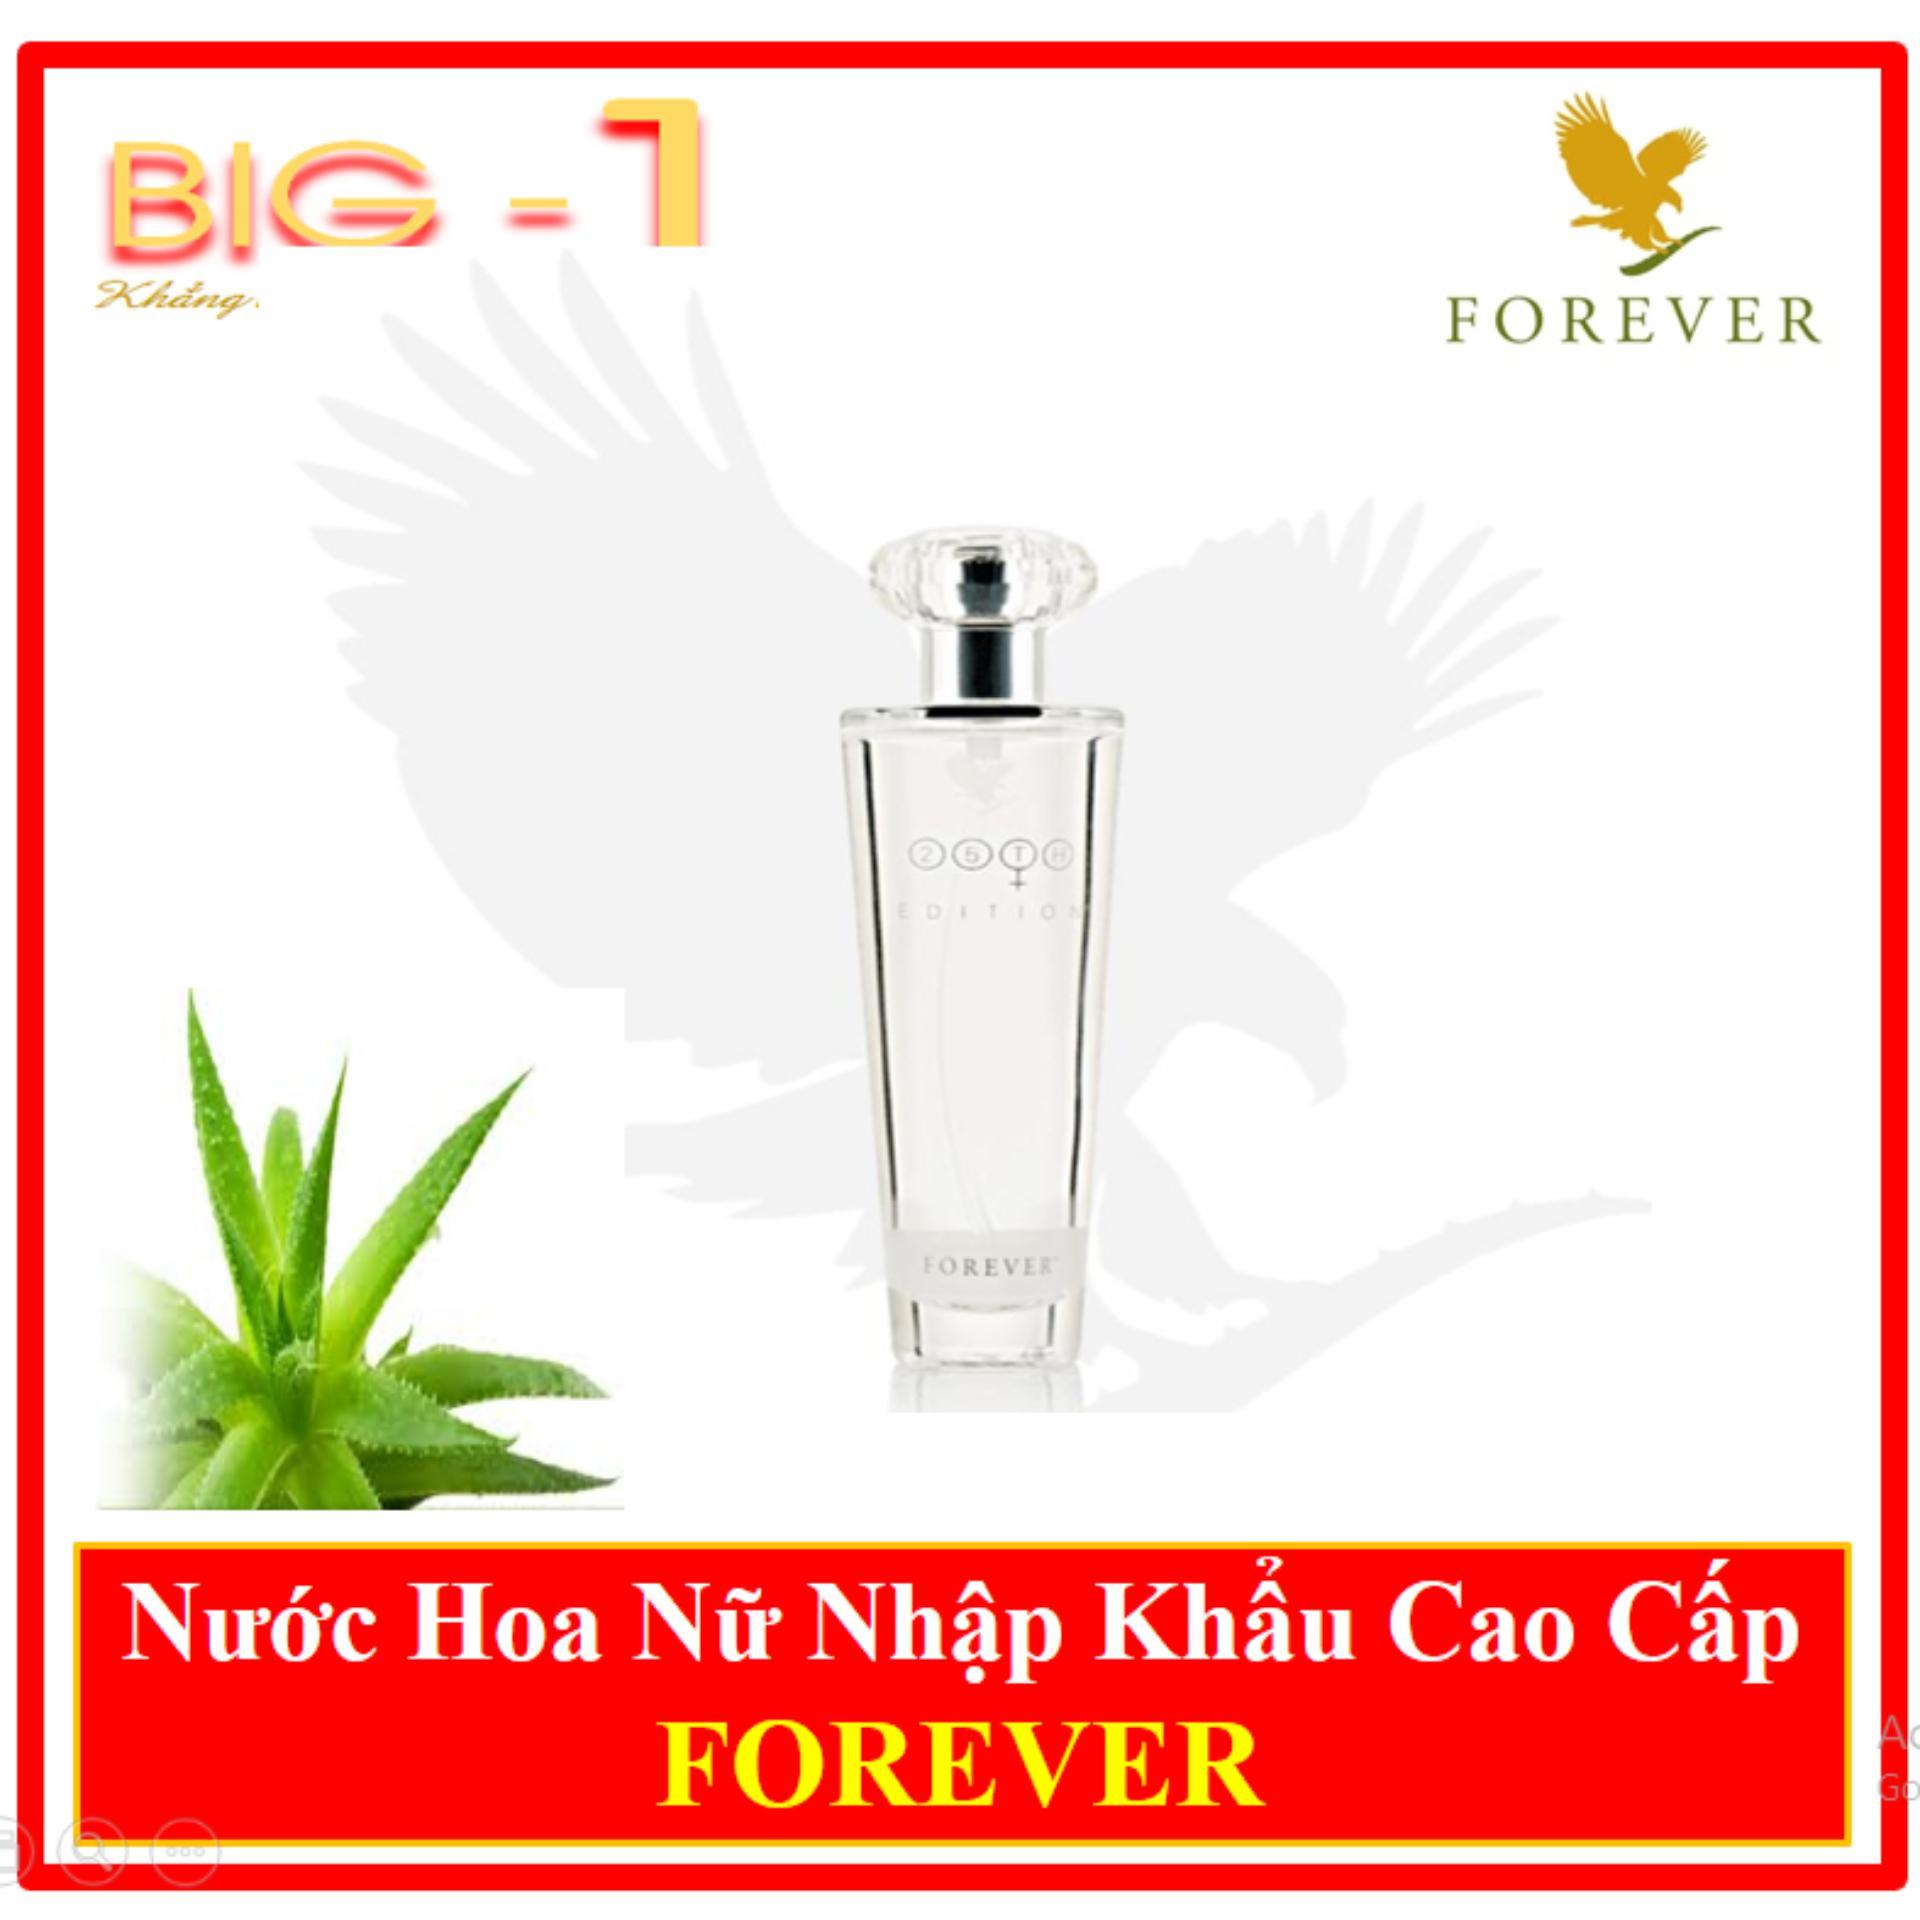 Nước hoa nữ Cao cấp - 25th Edition Perfume Spray for Women